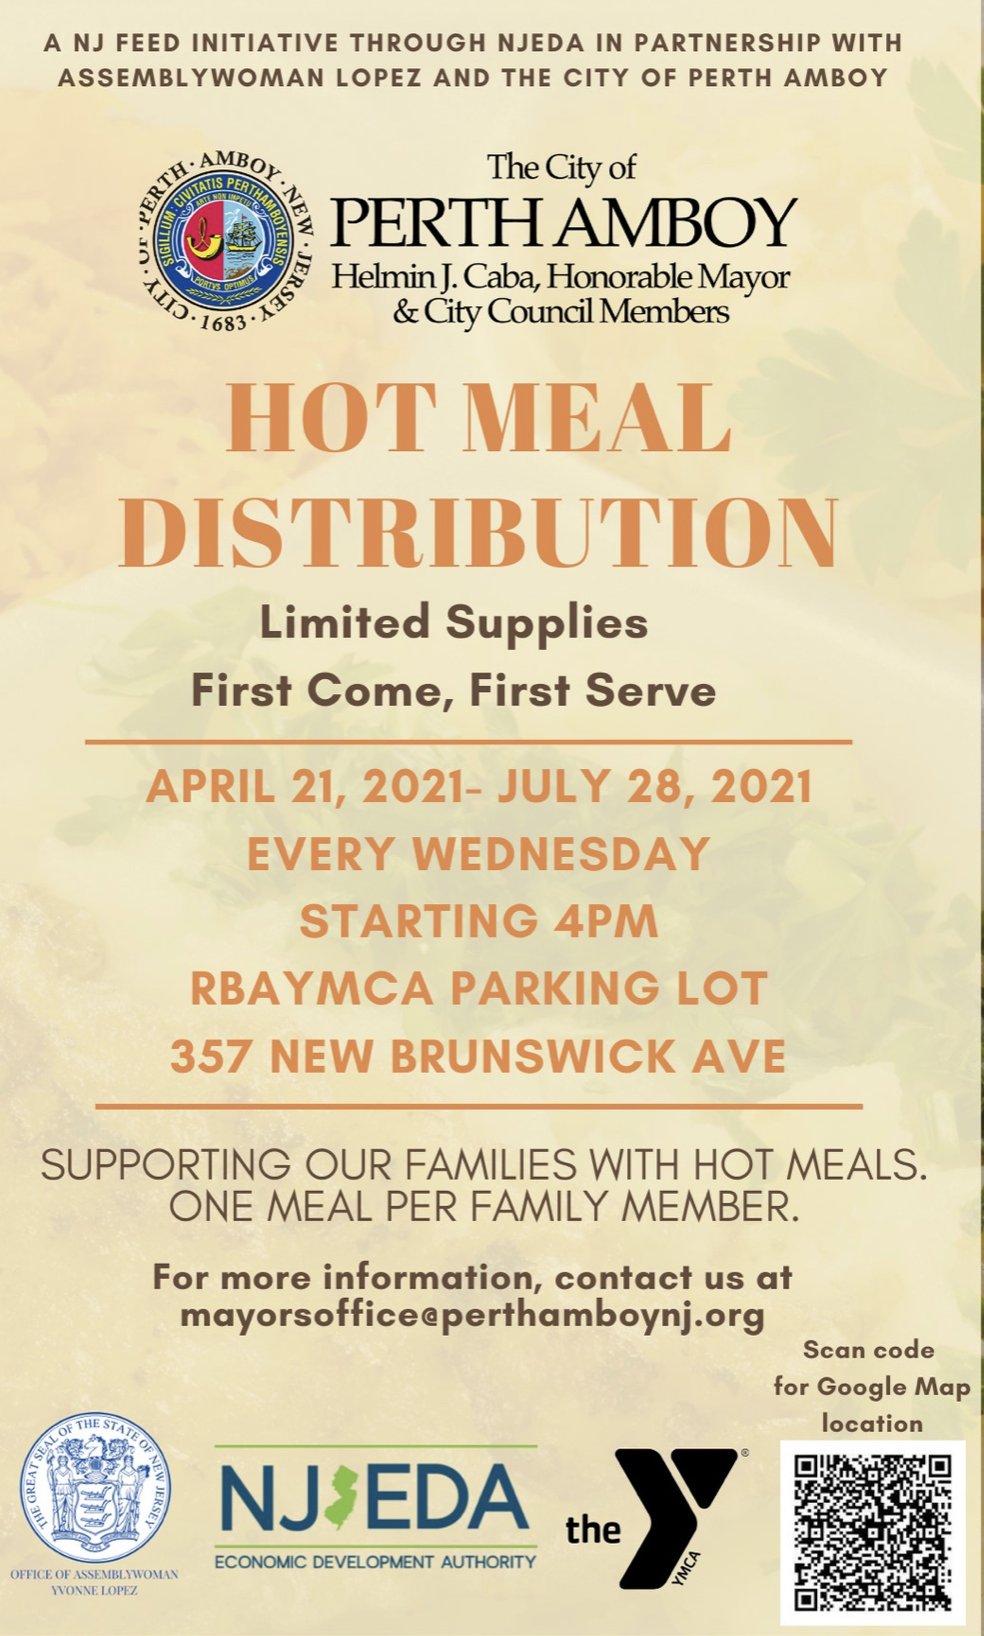 Perth Amboy Free Hot Meal Distribution